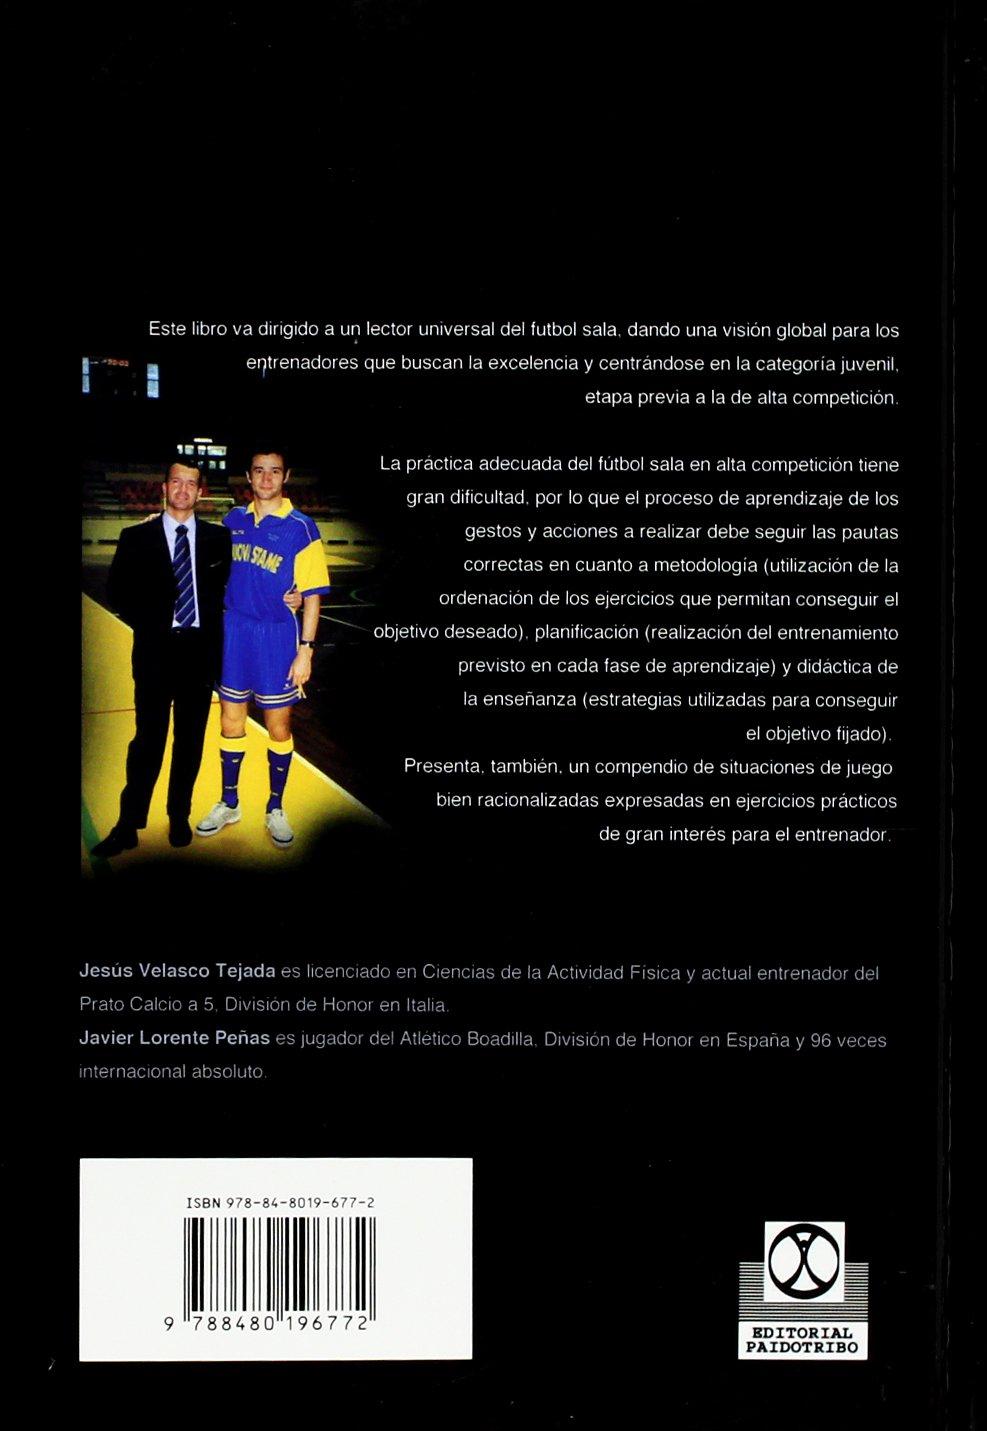 Entrenamiento de Base En Futbol Sala (Spanish Edition): Ricardo Canovas Linares: 9788480196772: Amazon.com: Books